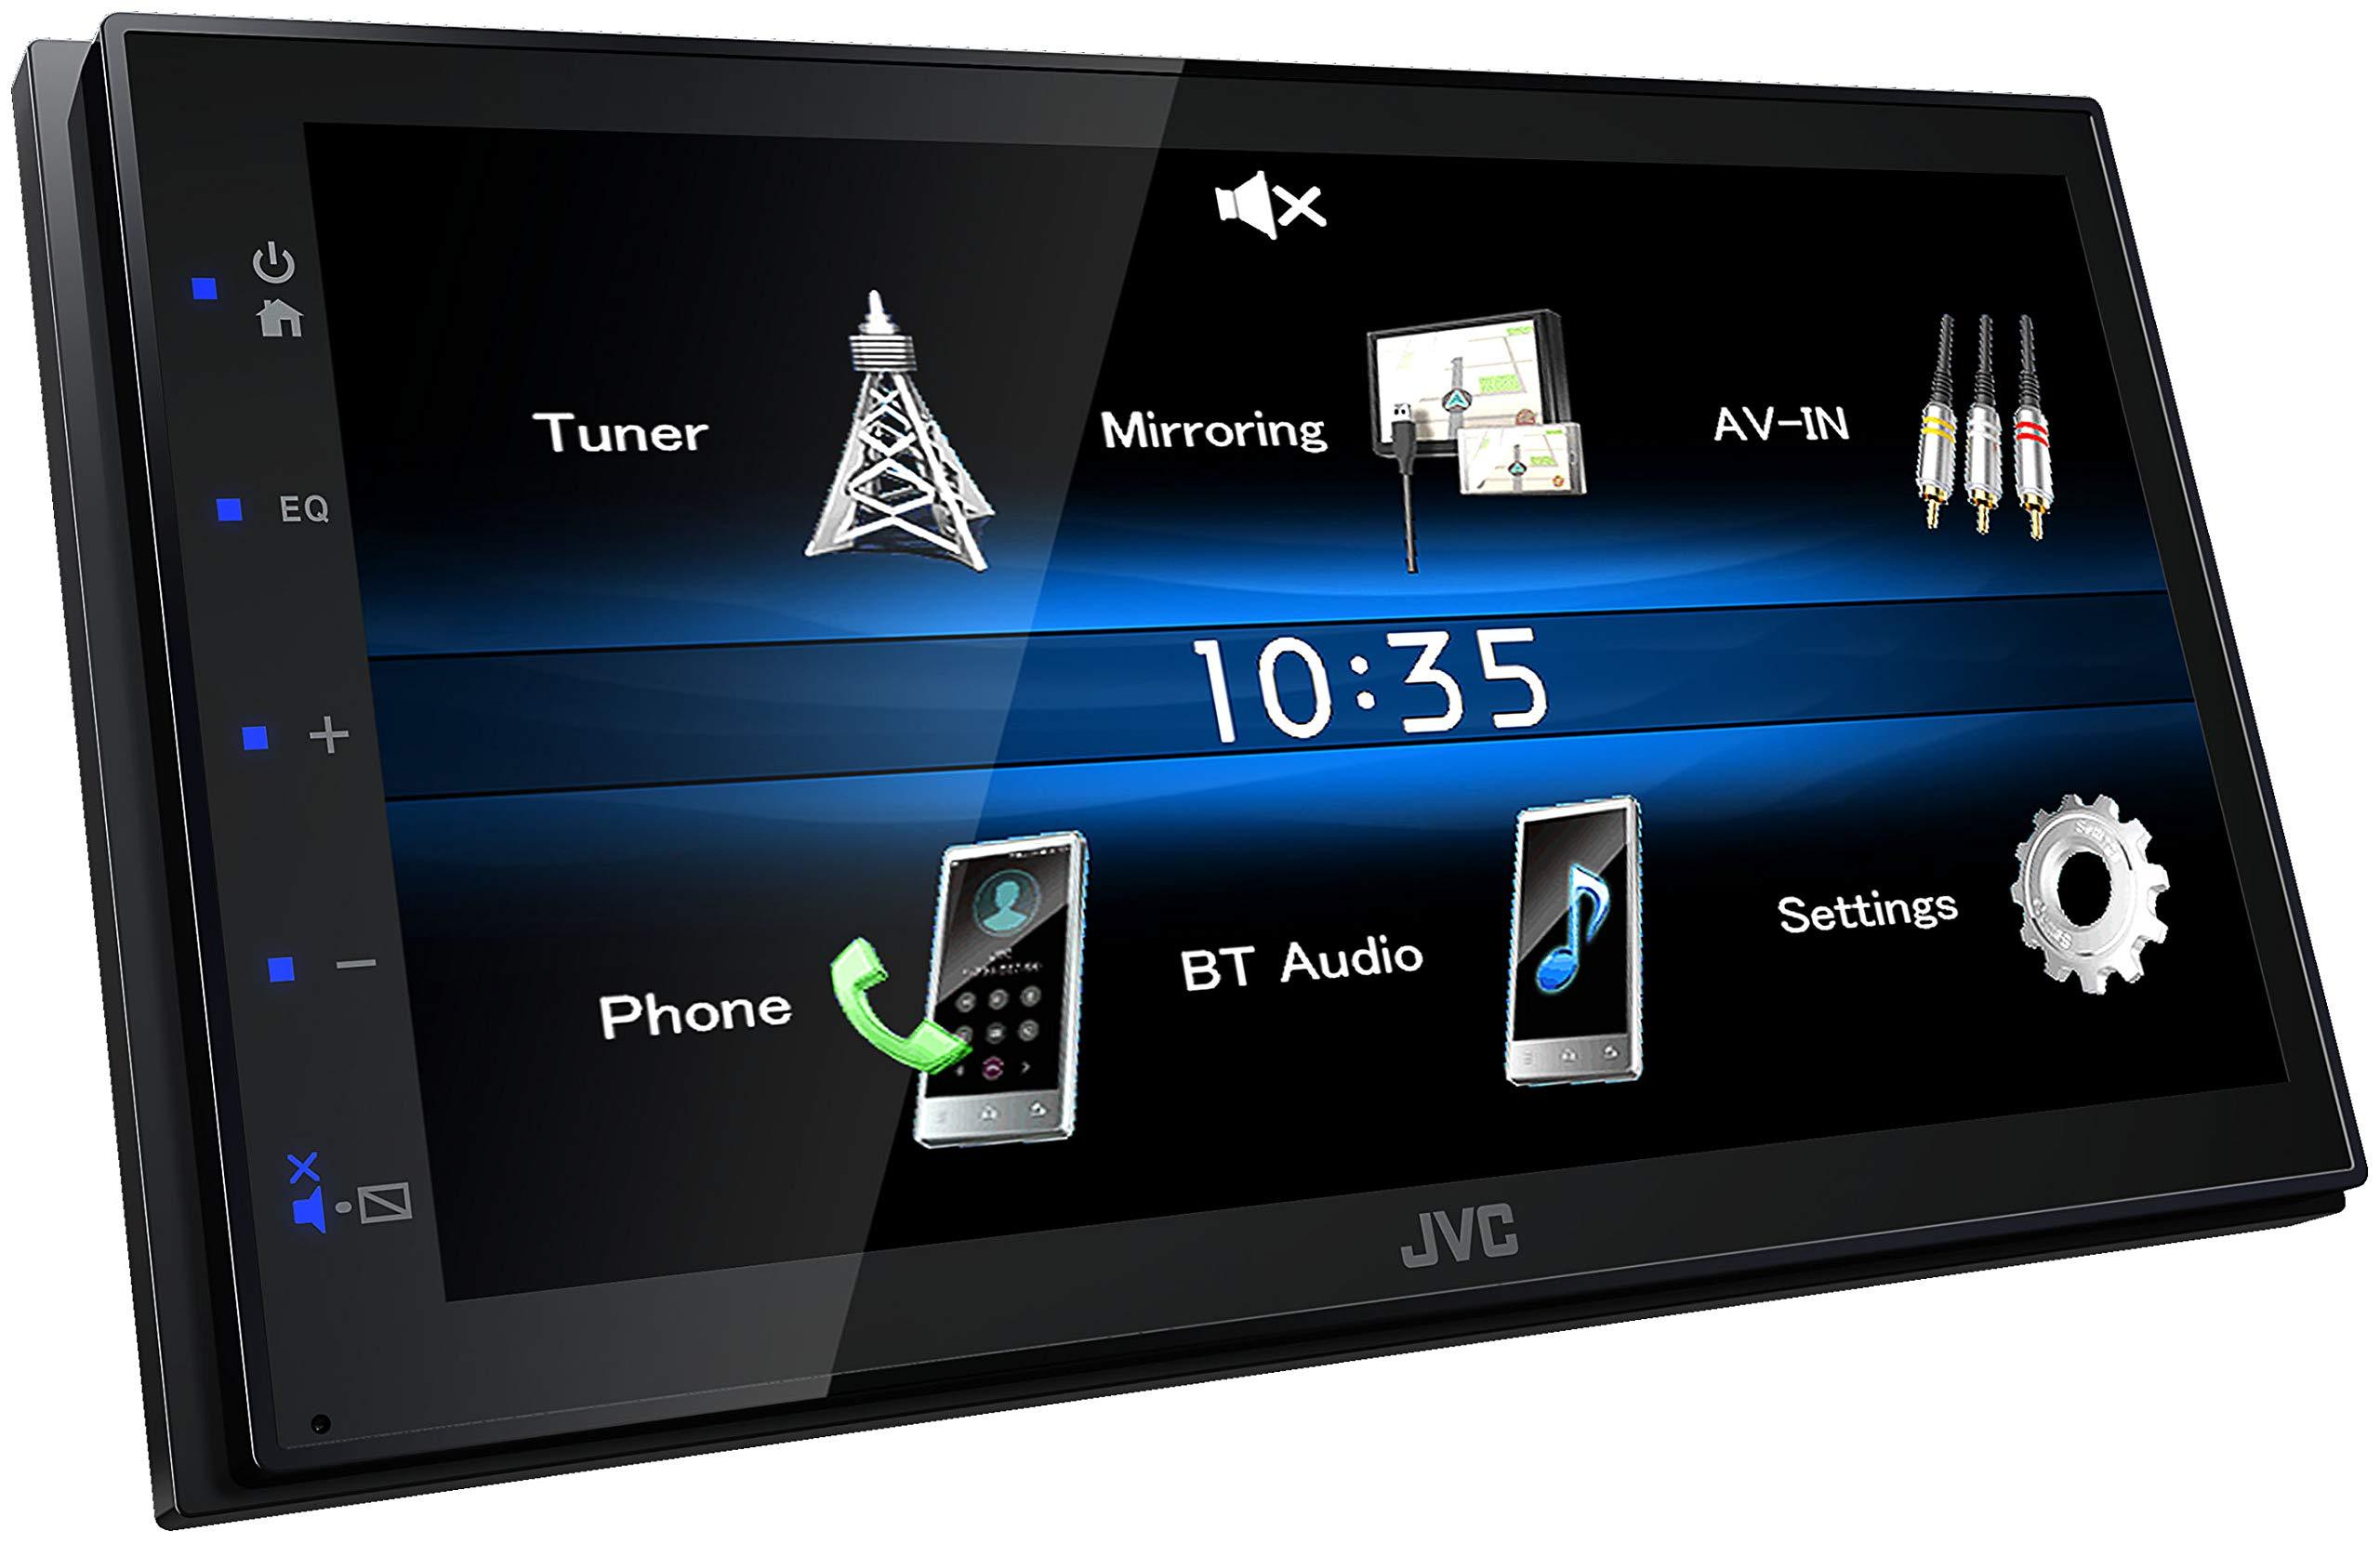 JVC-KW-M25BT-Digital-Media-Receiver-mit-173-cm-Hochglanz-Touchpanel-Bluetooth-Android-USB-Mirroring-4-x-50-Watt